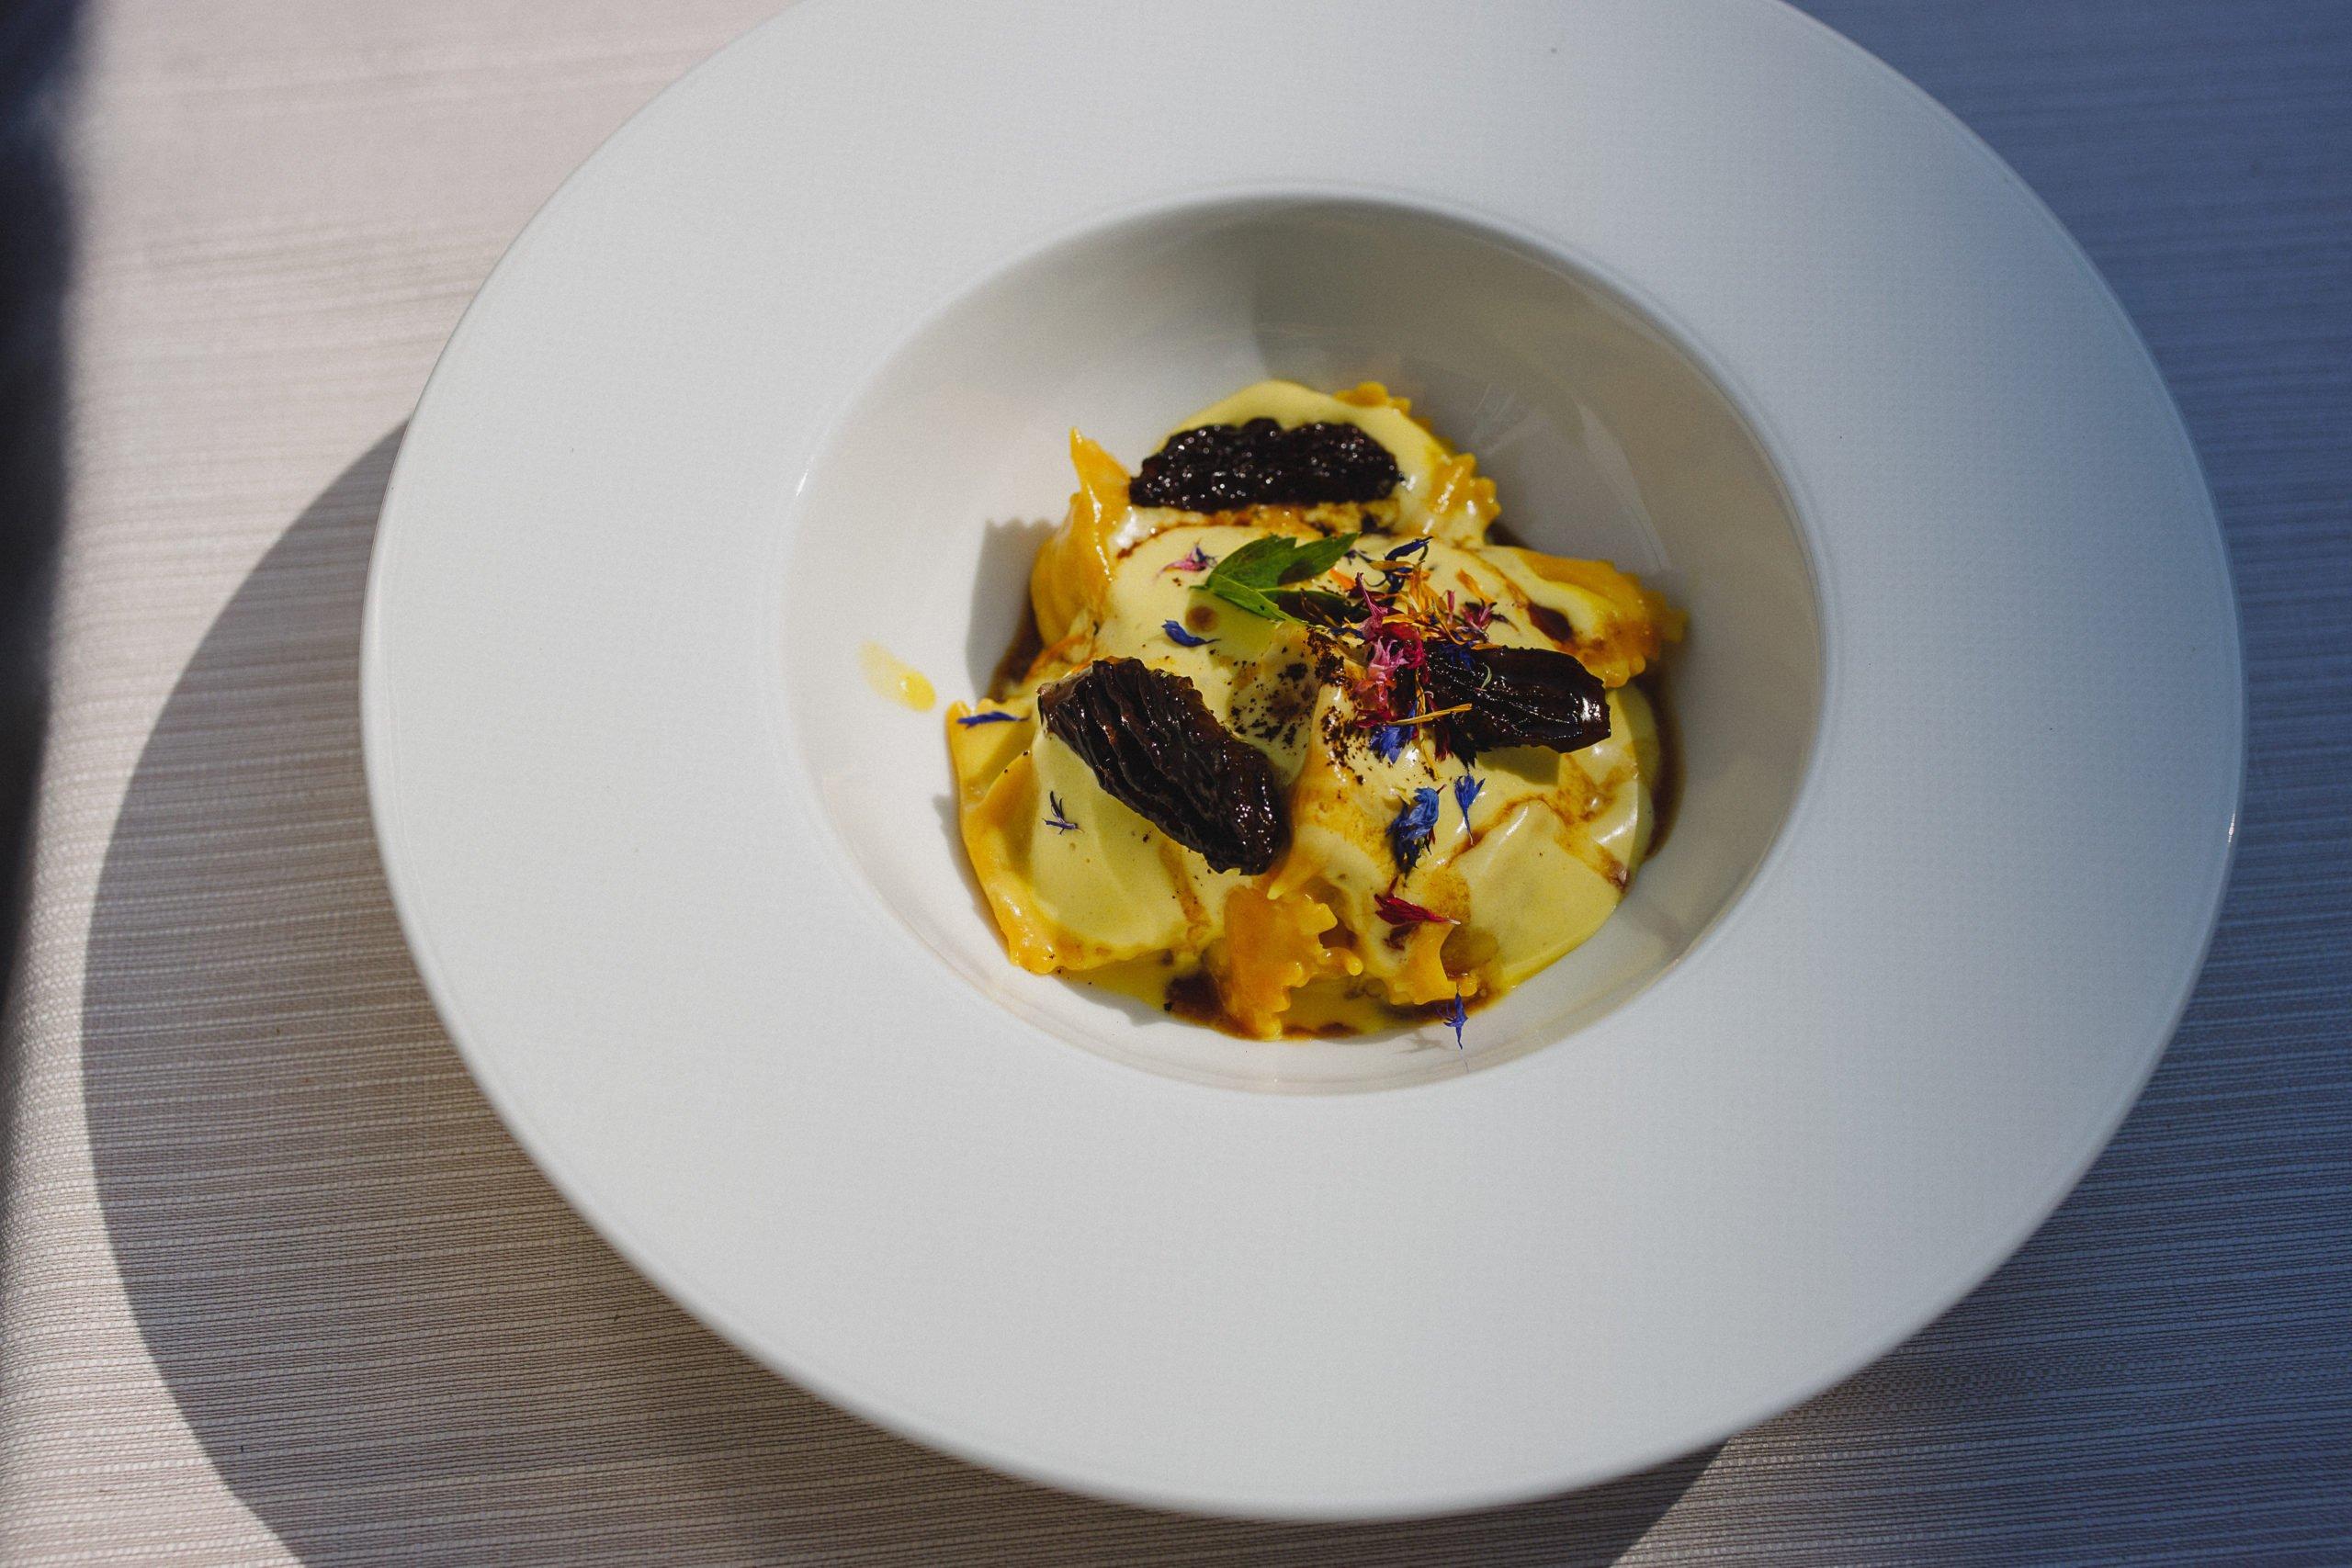 Cortina's Foodies feast